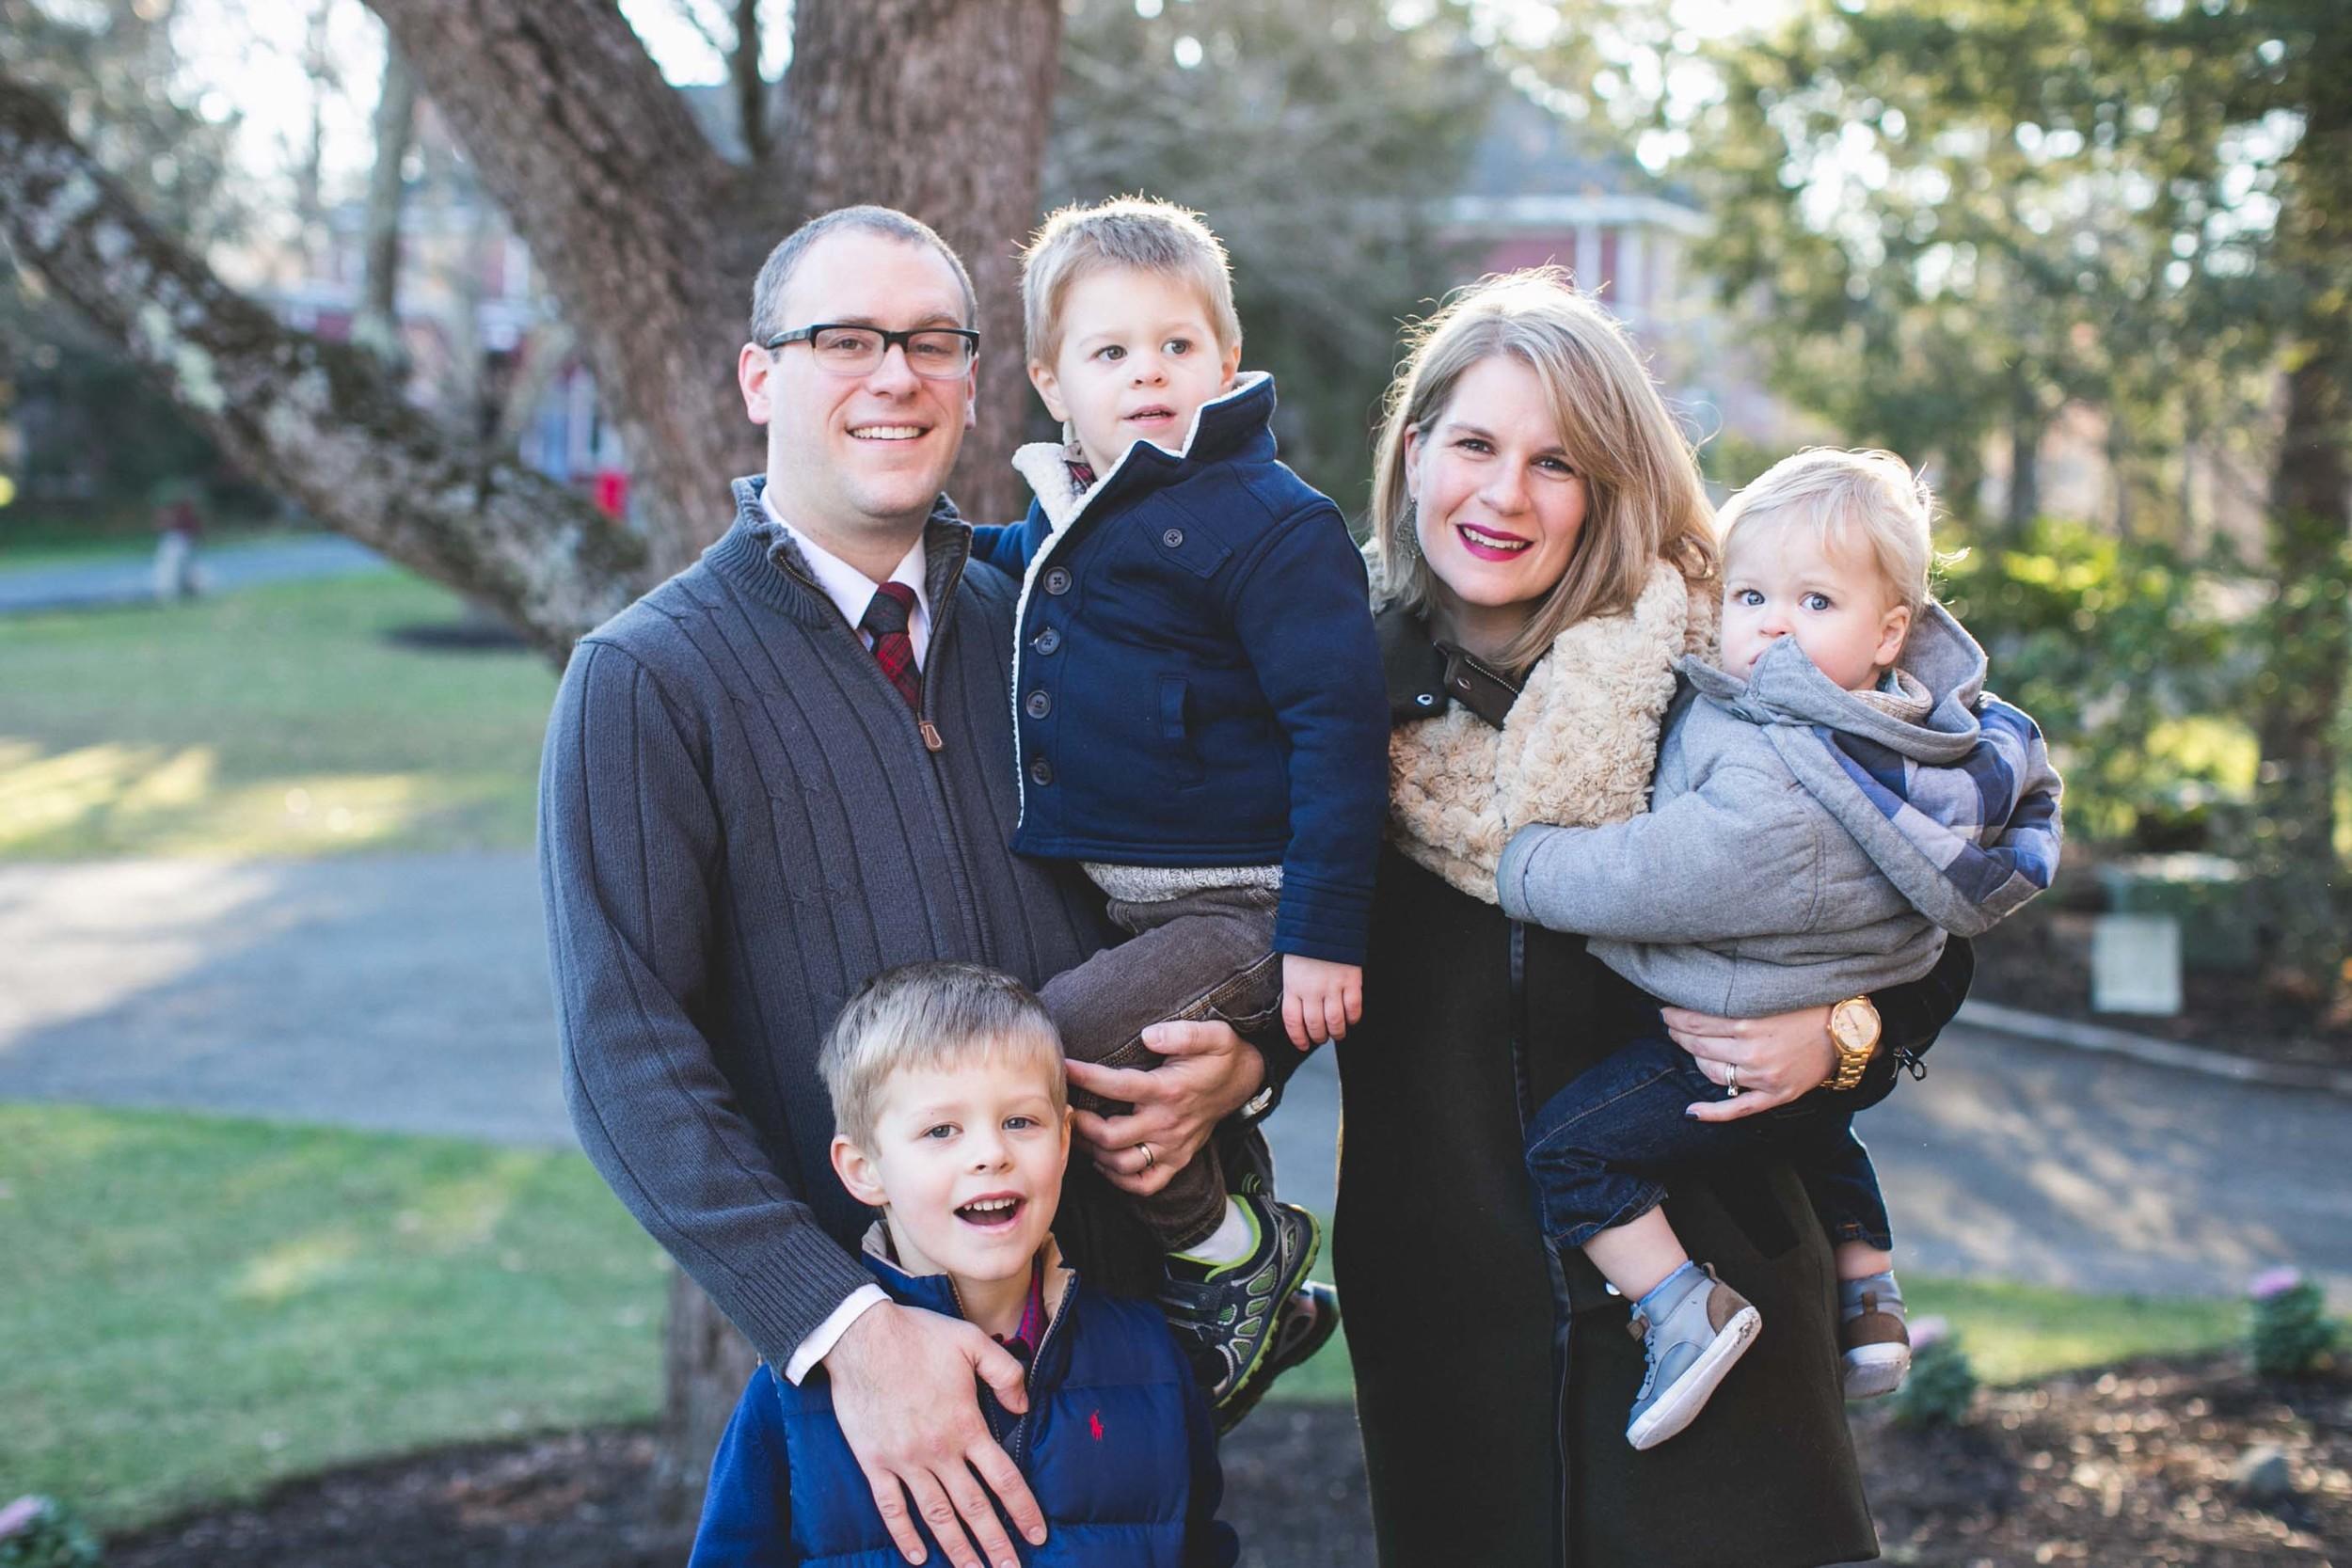 Family-Photographer-Beverly-MA-3-3.jpg